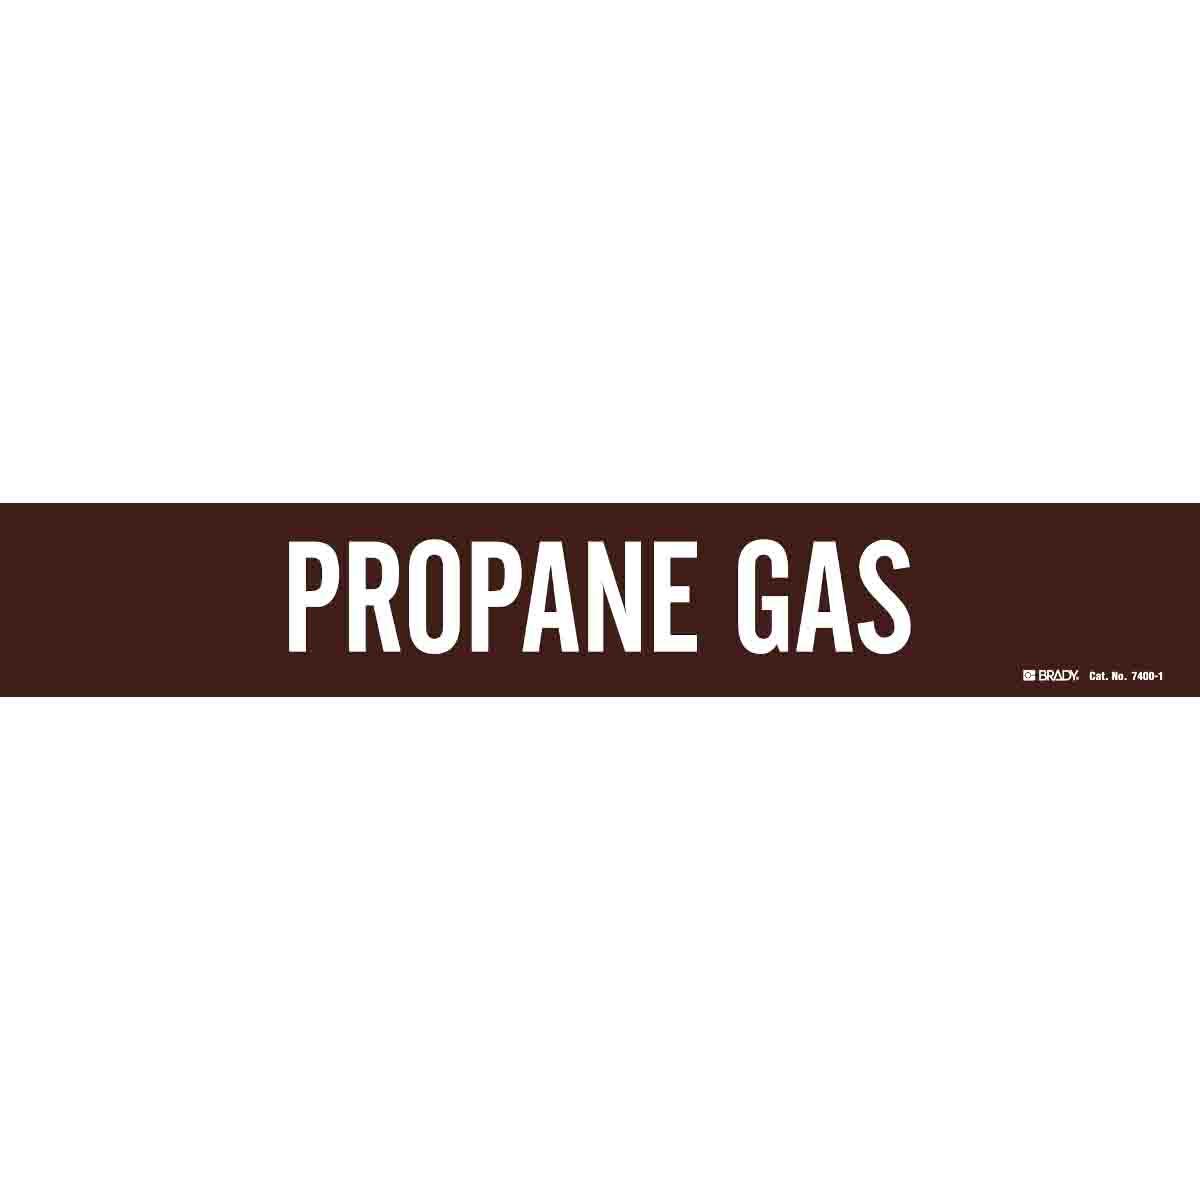 Legend Propane Gas 2 1//4 Height X 14 Width White On Brown Pressure Sensitive Vinyl Brady 7400-1 Self-Sticking Vinyl Pipe Marker B-946